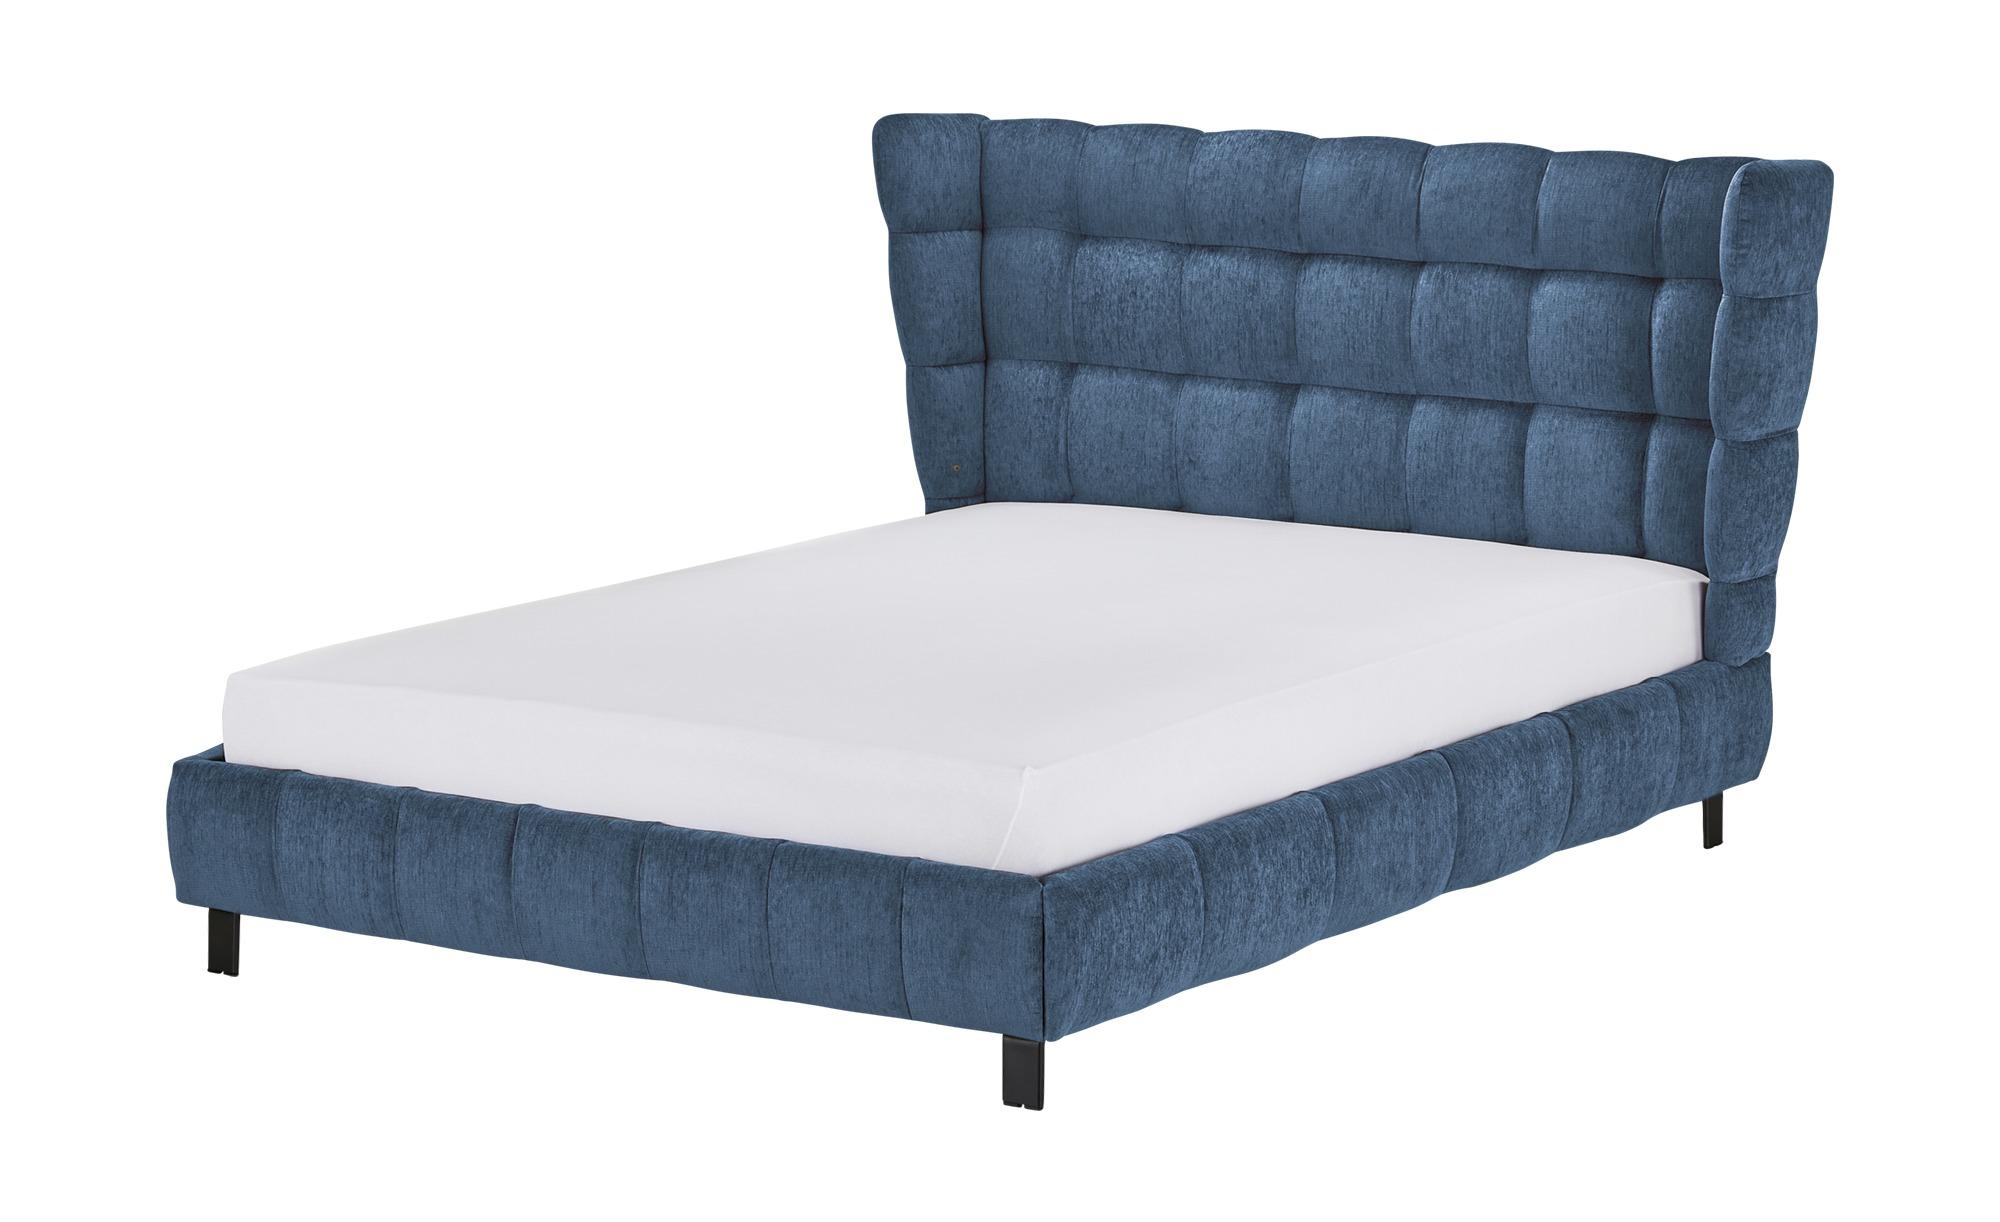 Polsterbettgestell 140x200 - blau Caterham ¦ blau ¦ Maße (cm): B: 168 H: 109 T: 214 Betten > Polsterbetten - Höffner